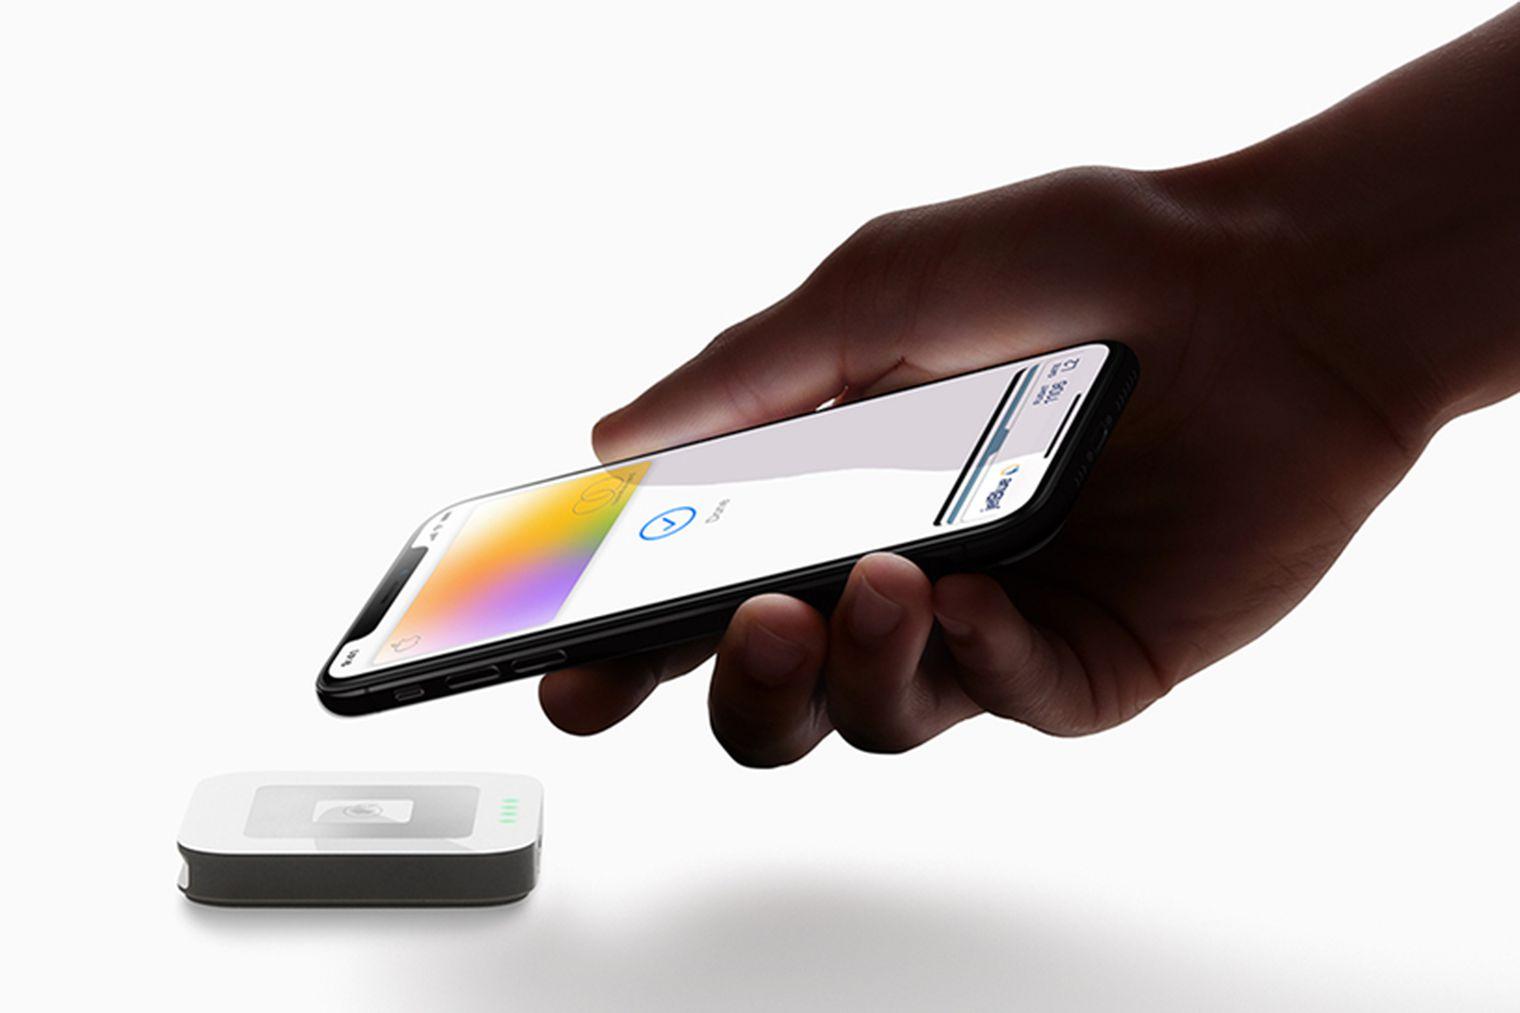 Apple_Card_hand_iPhoneXS_payment_032519_big.jpg.large.0.jpg